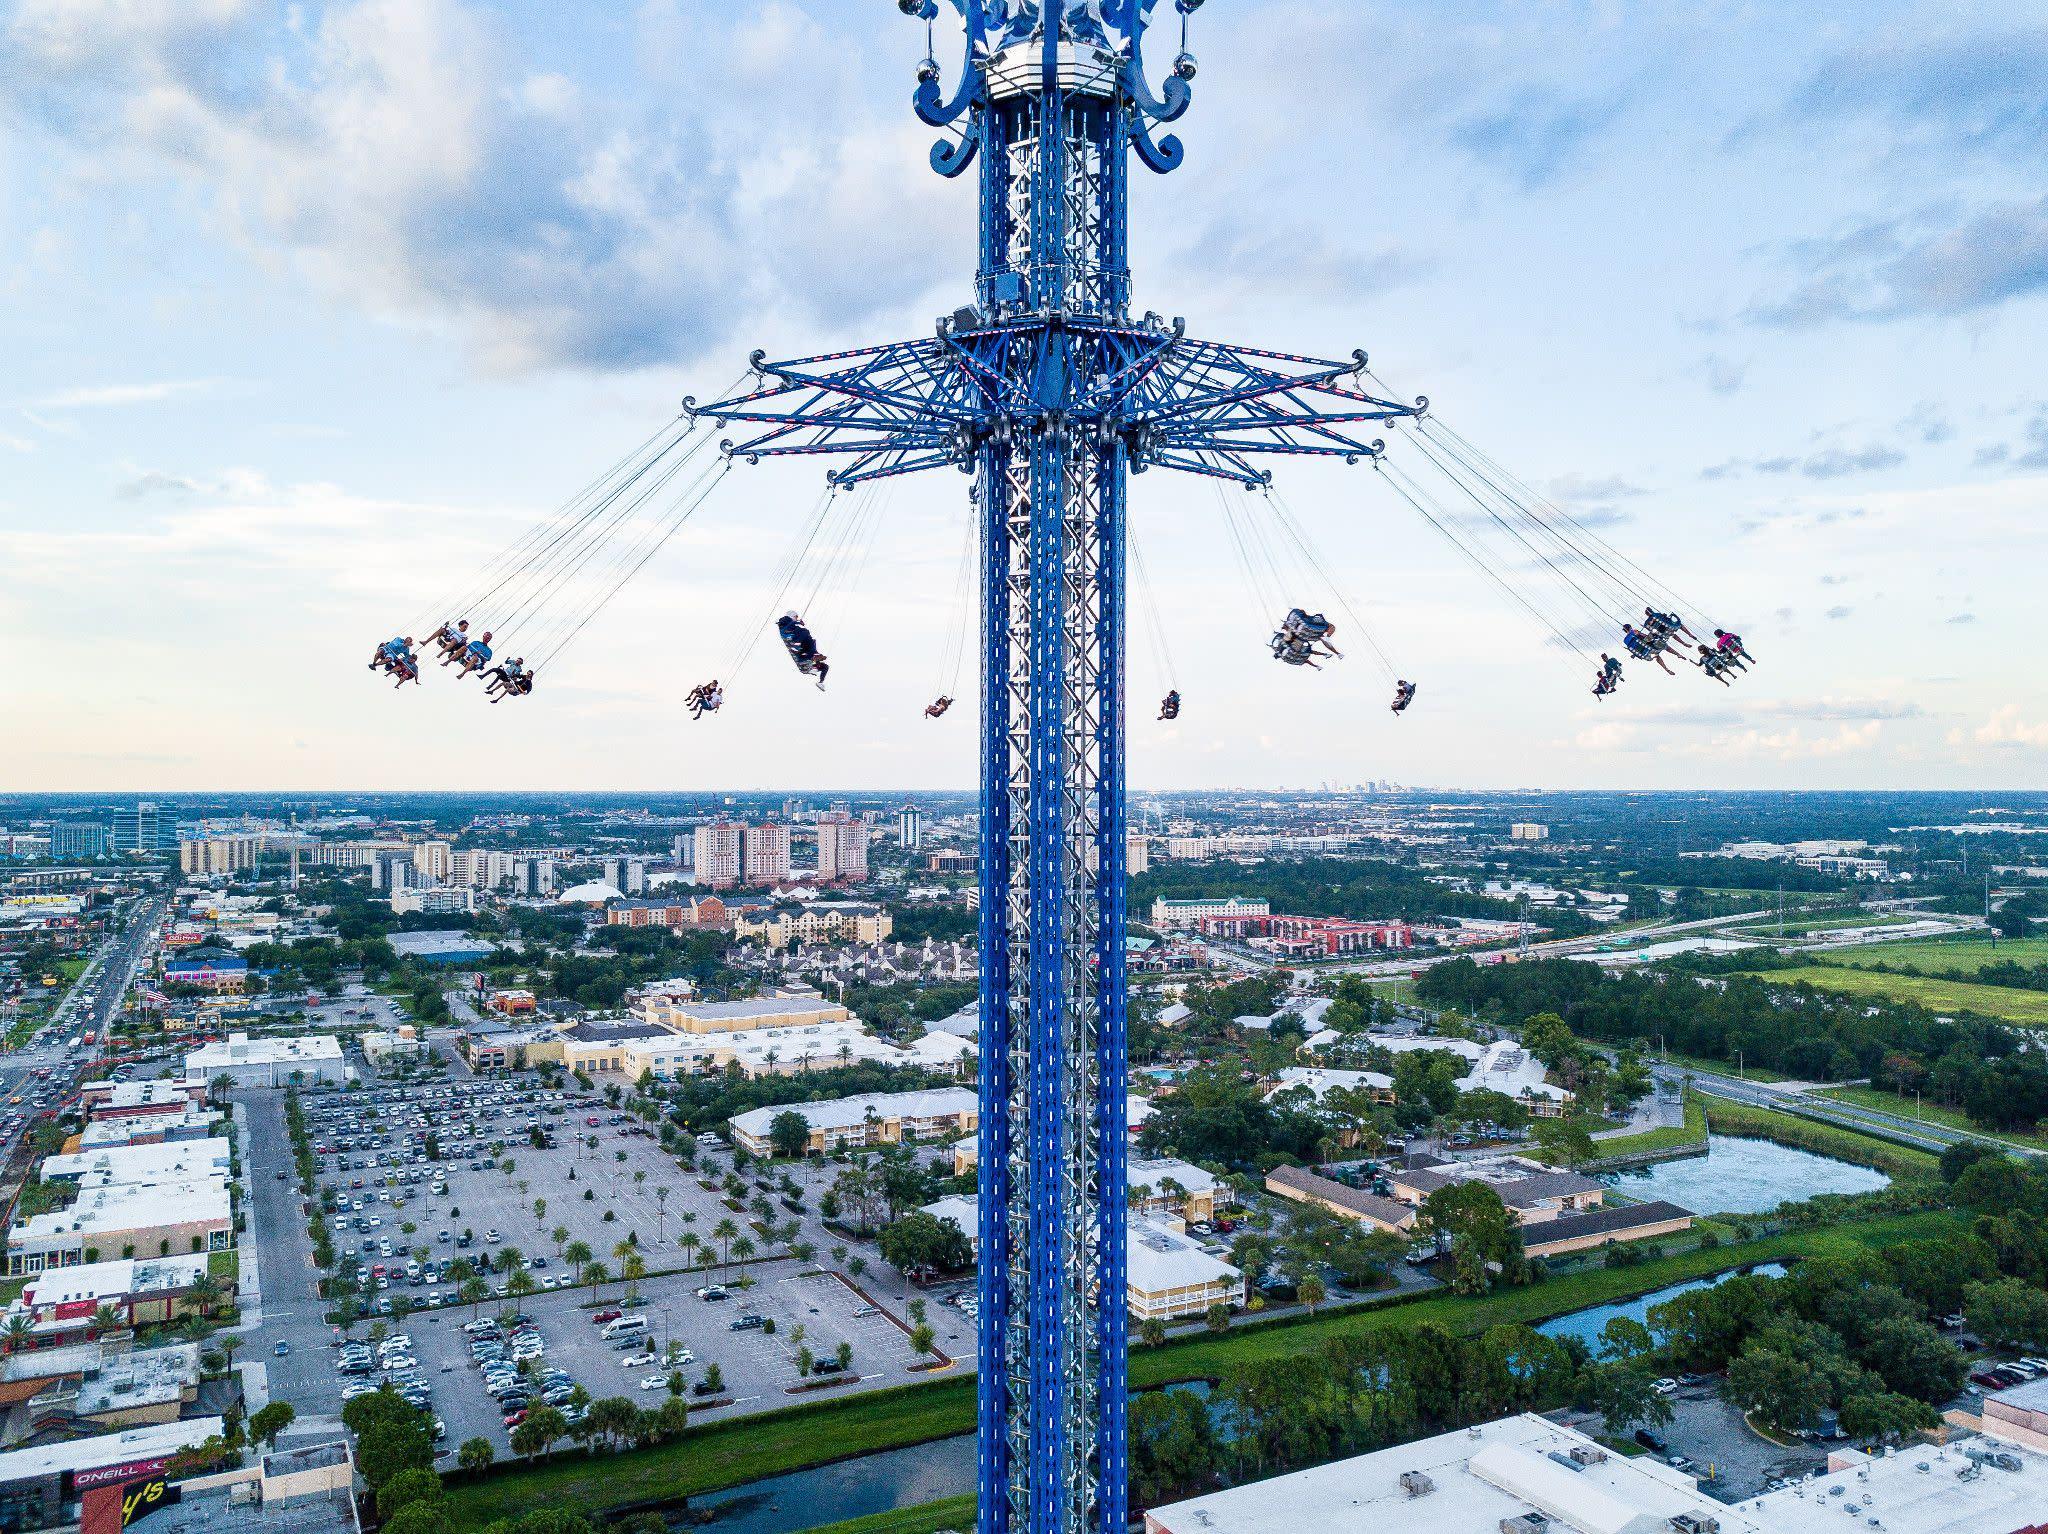 Orlando StarFlyer at ICON Park